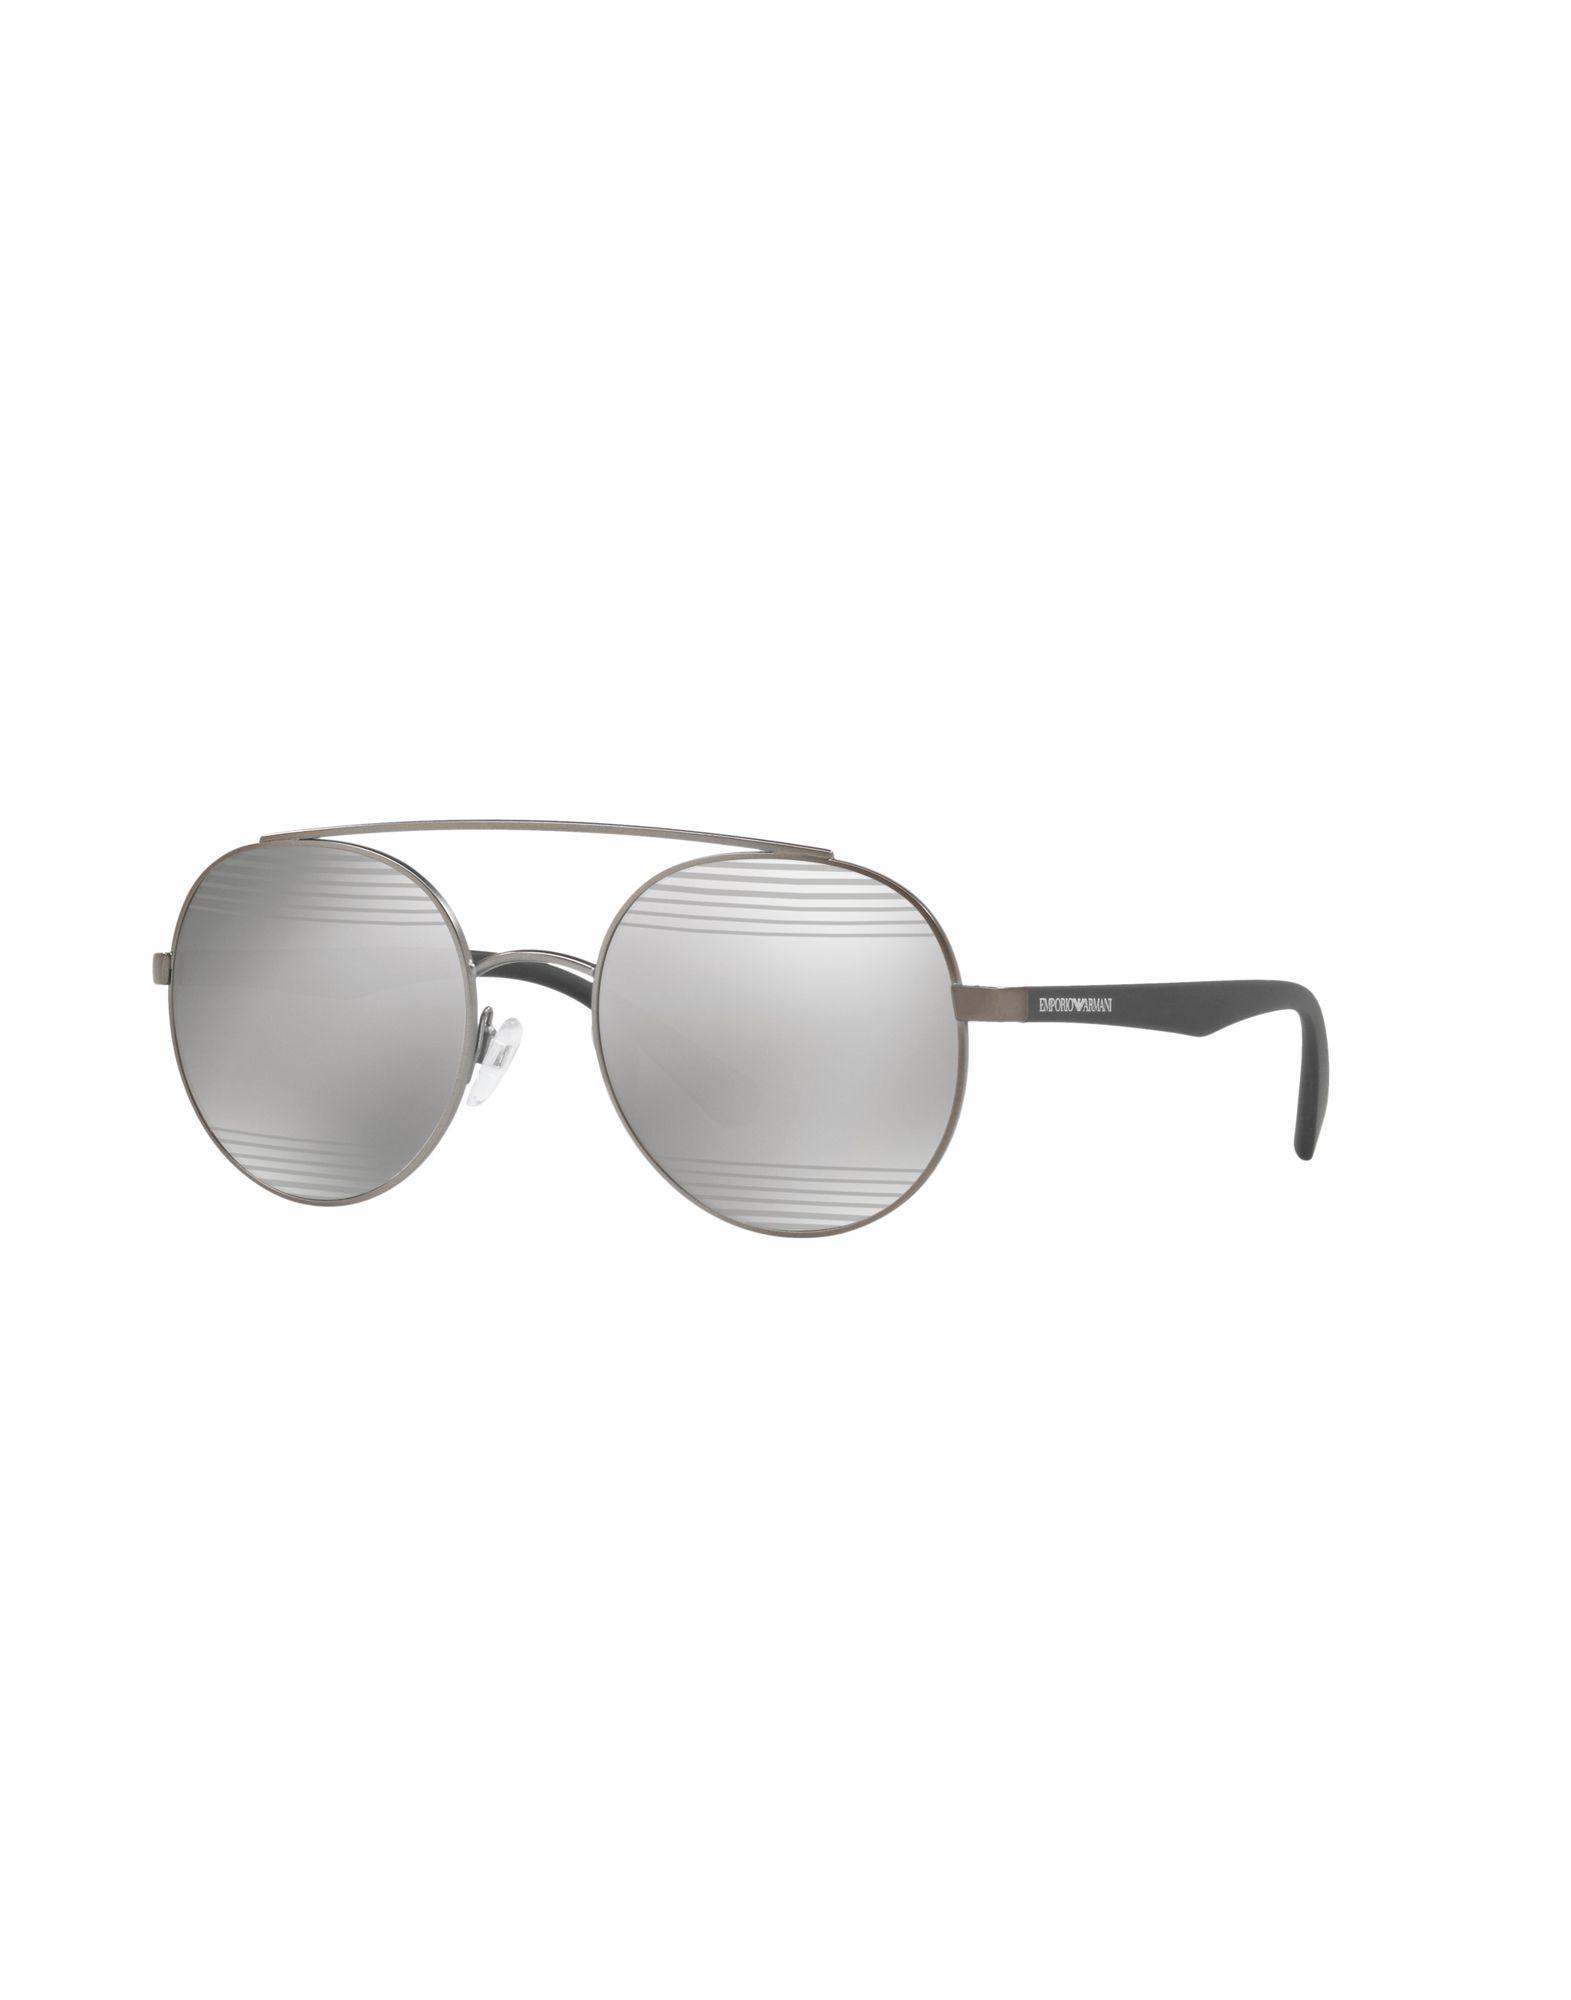 EMPORIO ARMANI Солнечные очки carshiro 9150 uv400 protection resin lens polarized night vision driving glasses